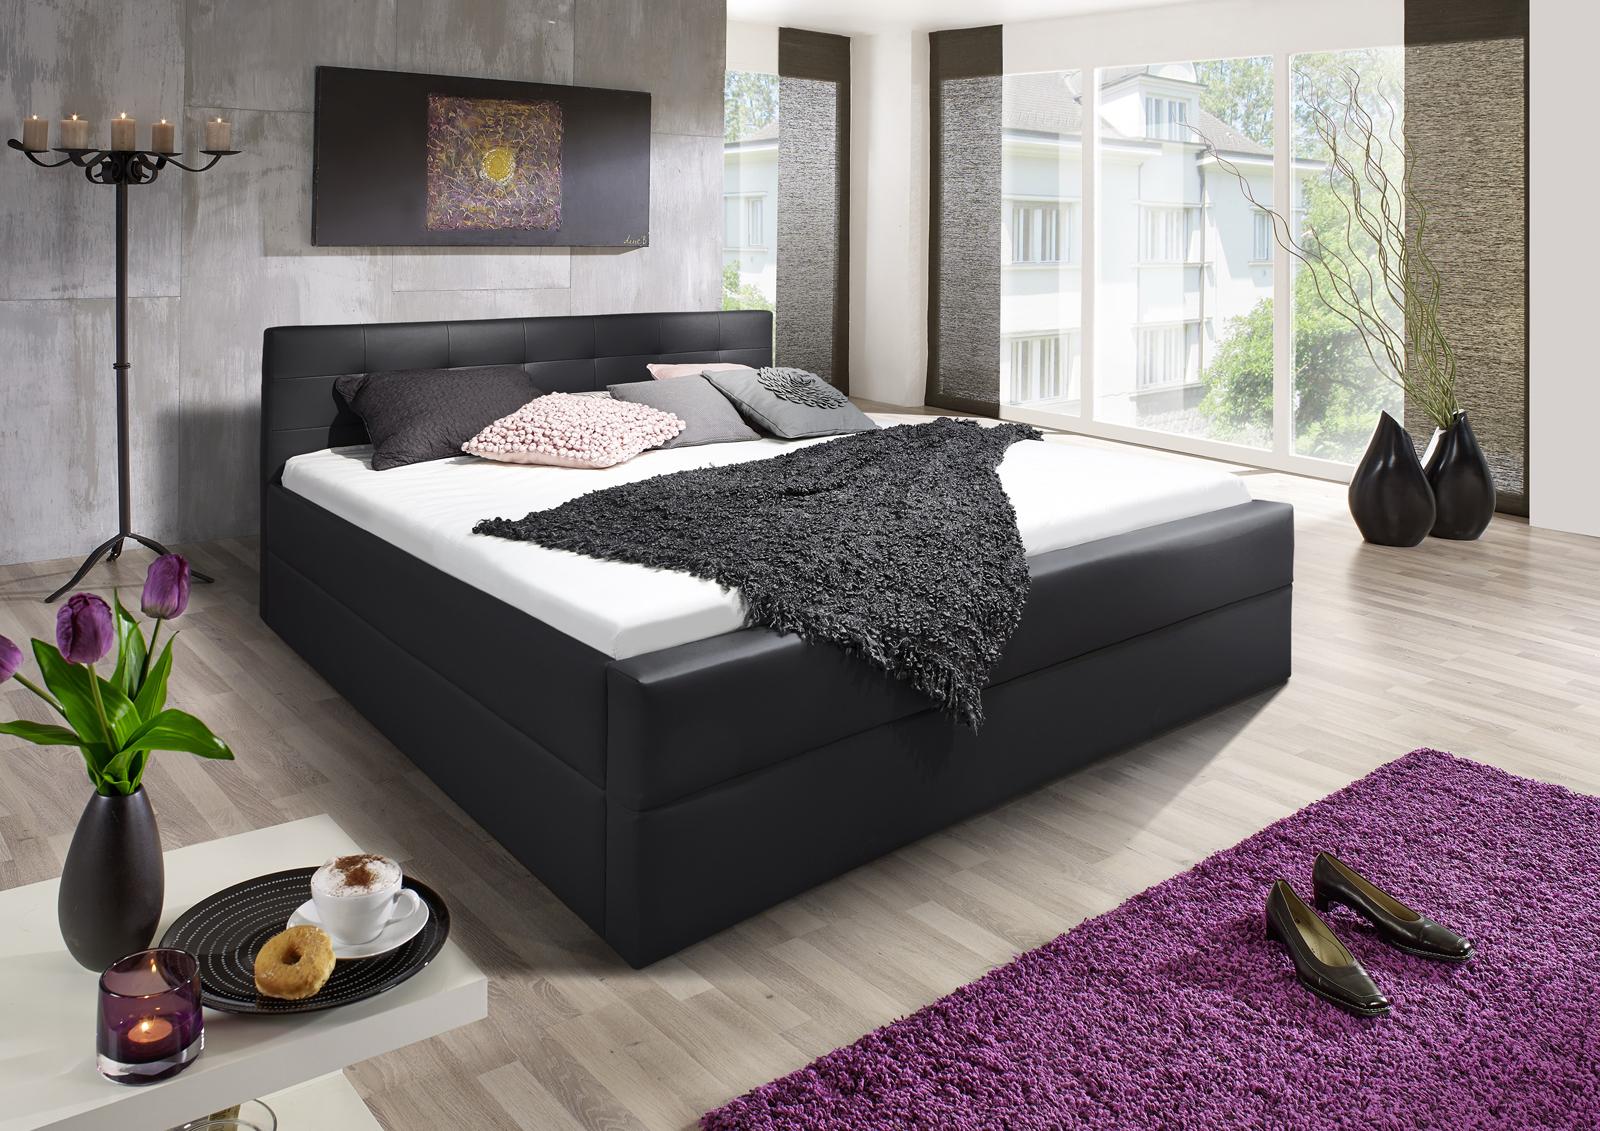 sam design boxspringbett 140 x 200 cm schwarz kappa. Black Bedroom Furniture Sets. Home Design Ideas